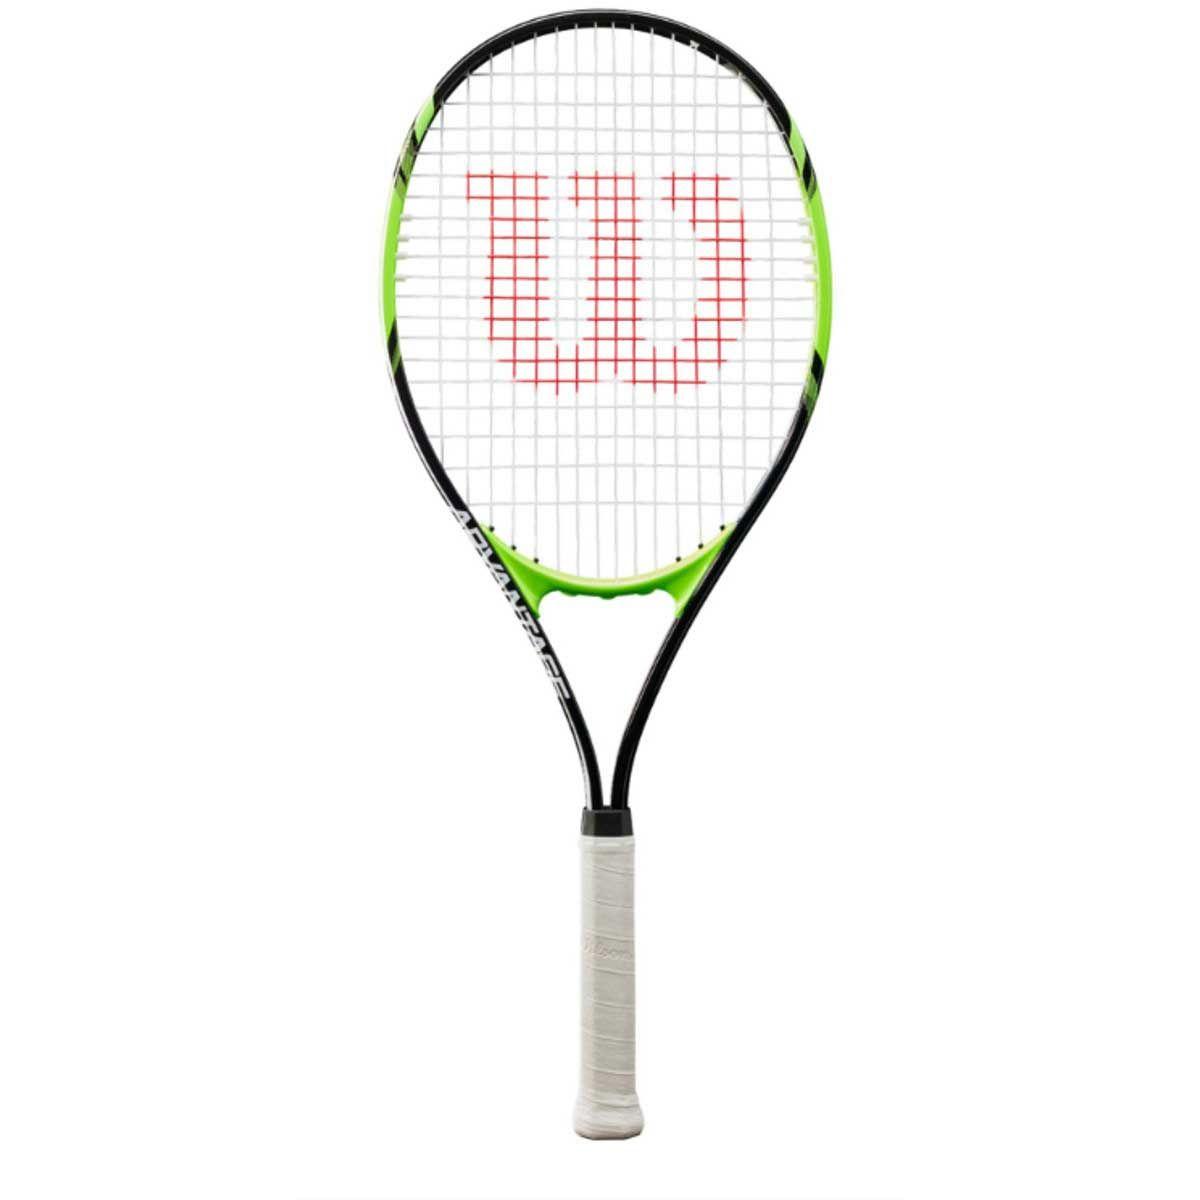 Buy Wilson Advantage Xl Tennisracquet 274 Gm Strung Online India Order Wilson Advantage Xl Tennis Racquet 274 Gm Tennis Racquet Racquets